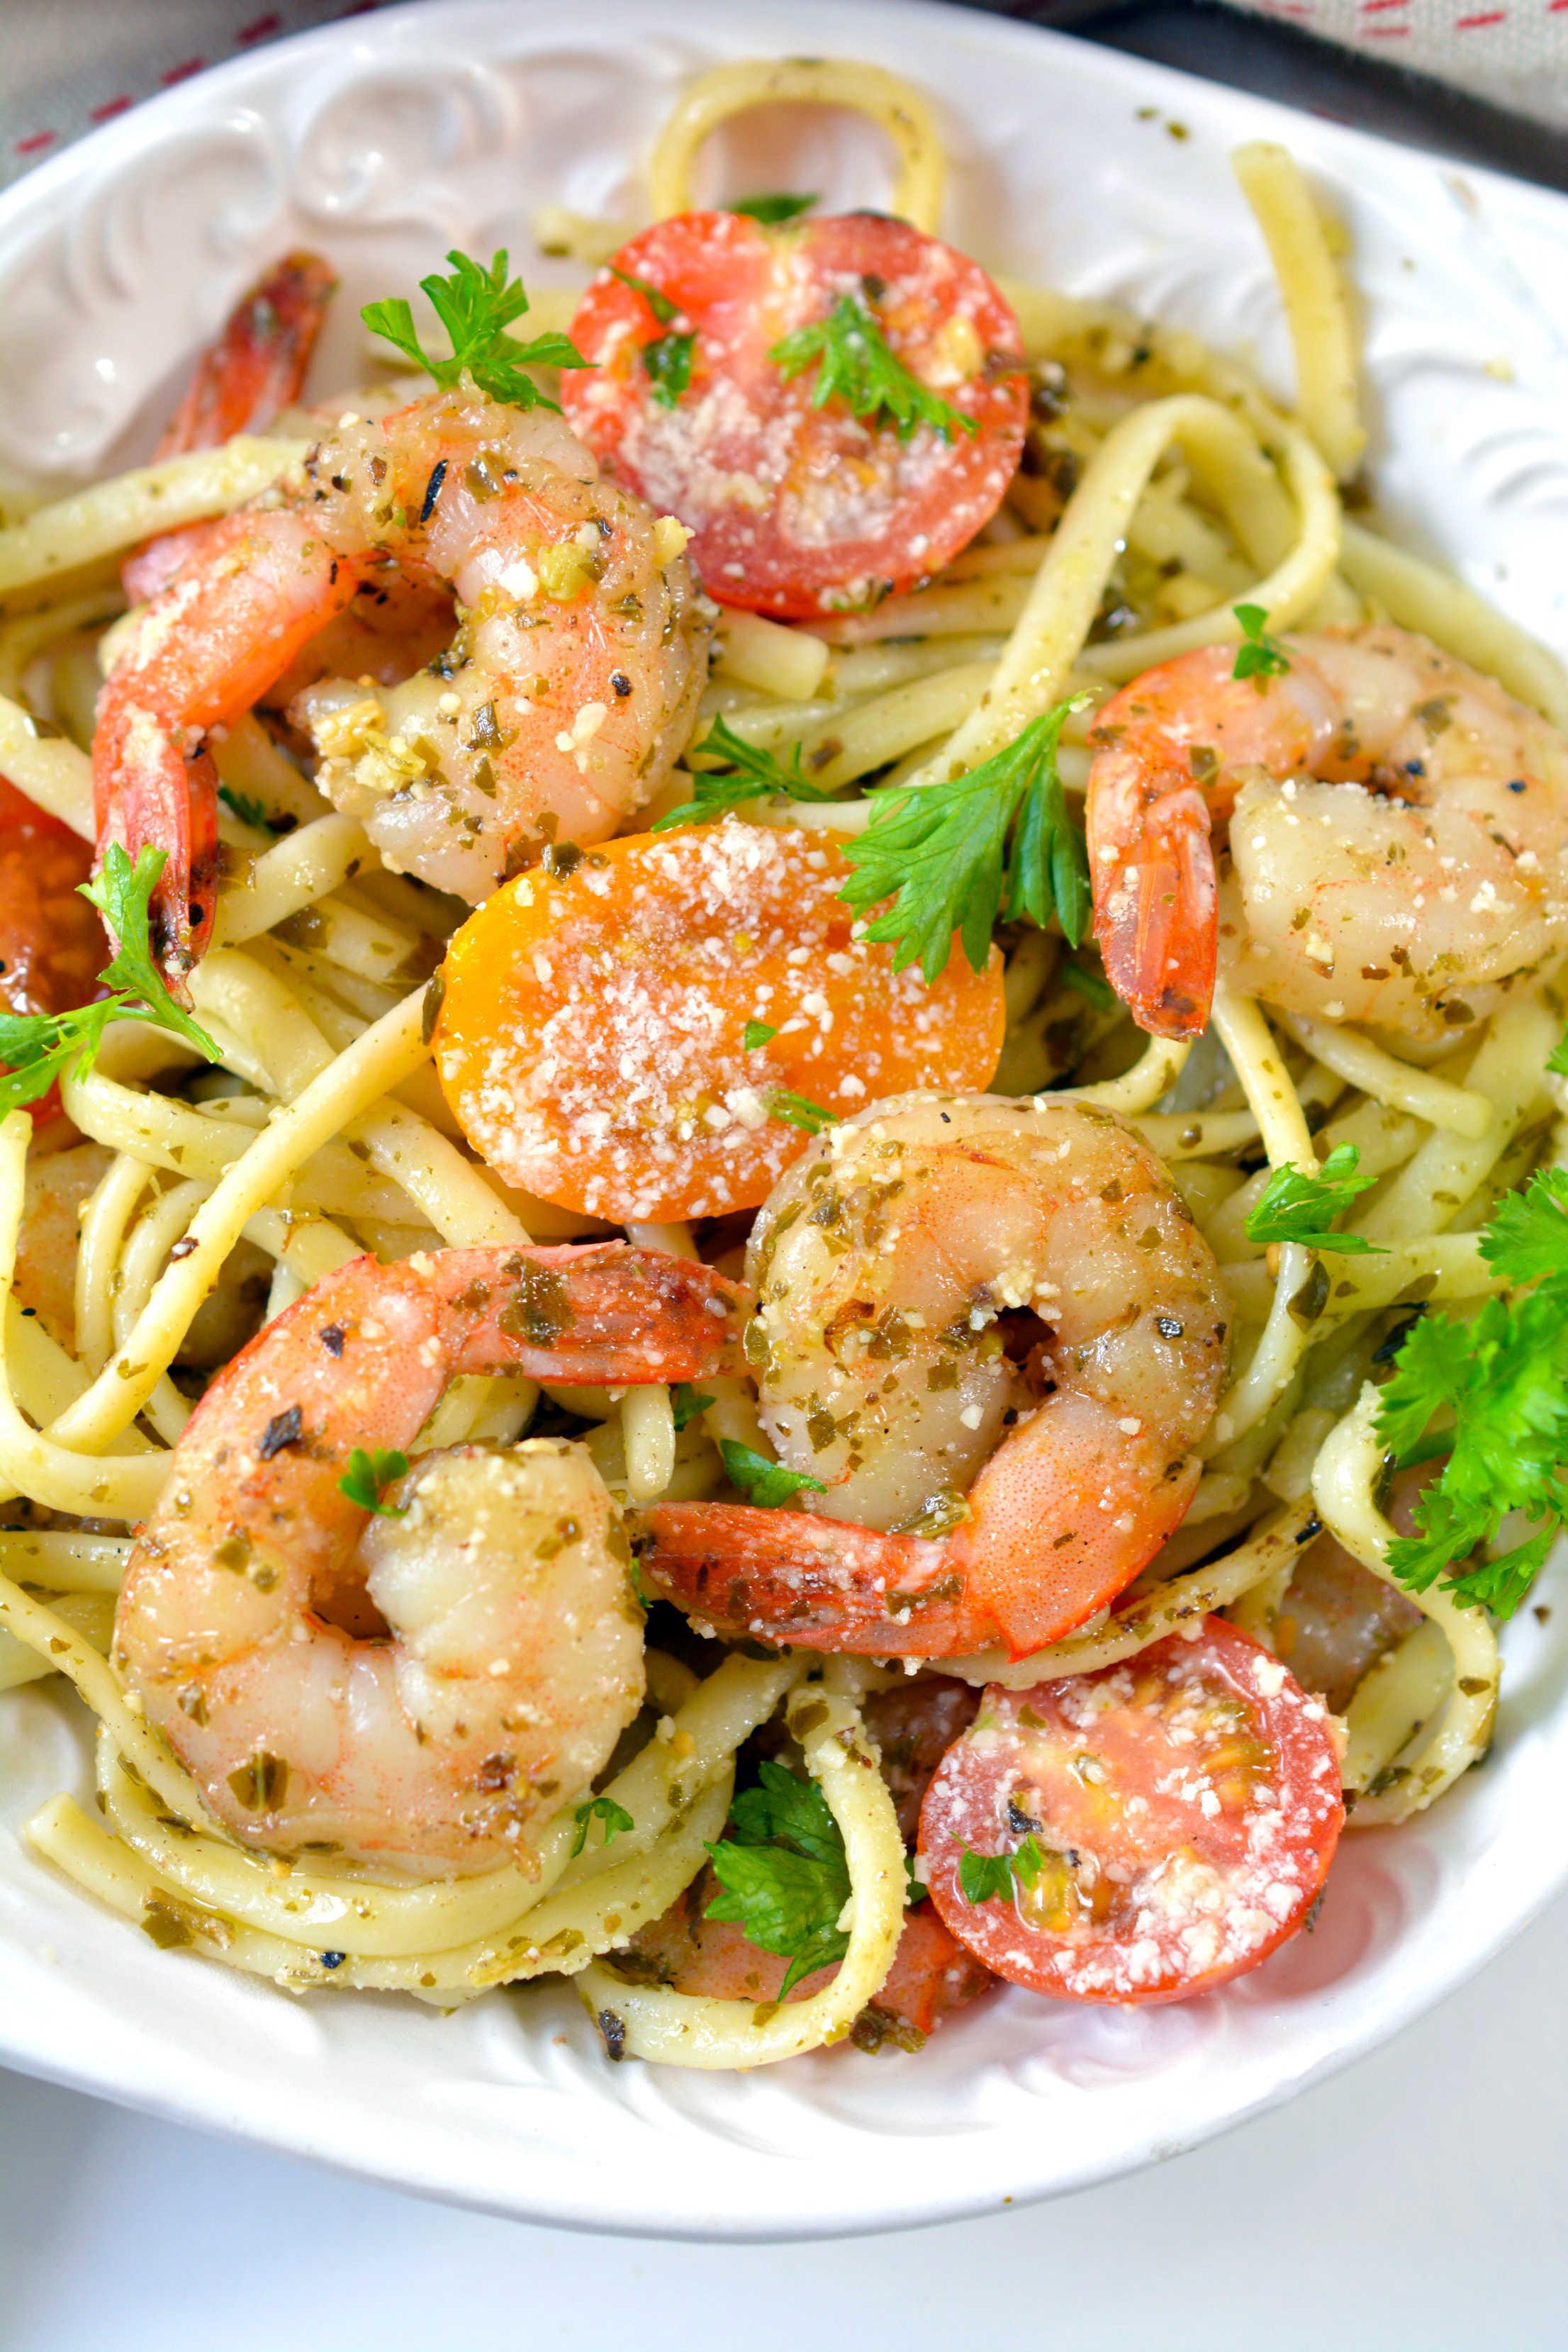 Shrimp Pesto Pasta on a plate